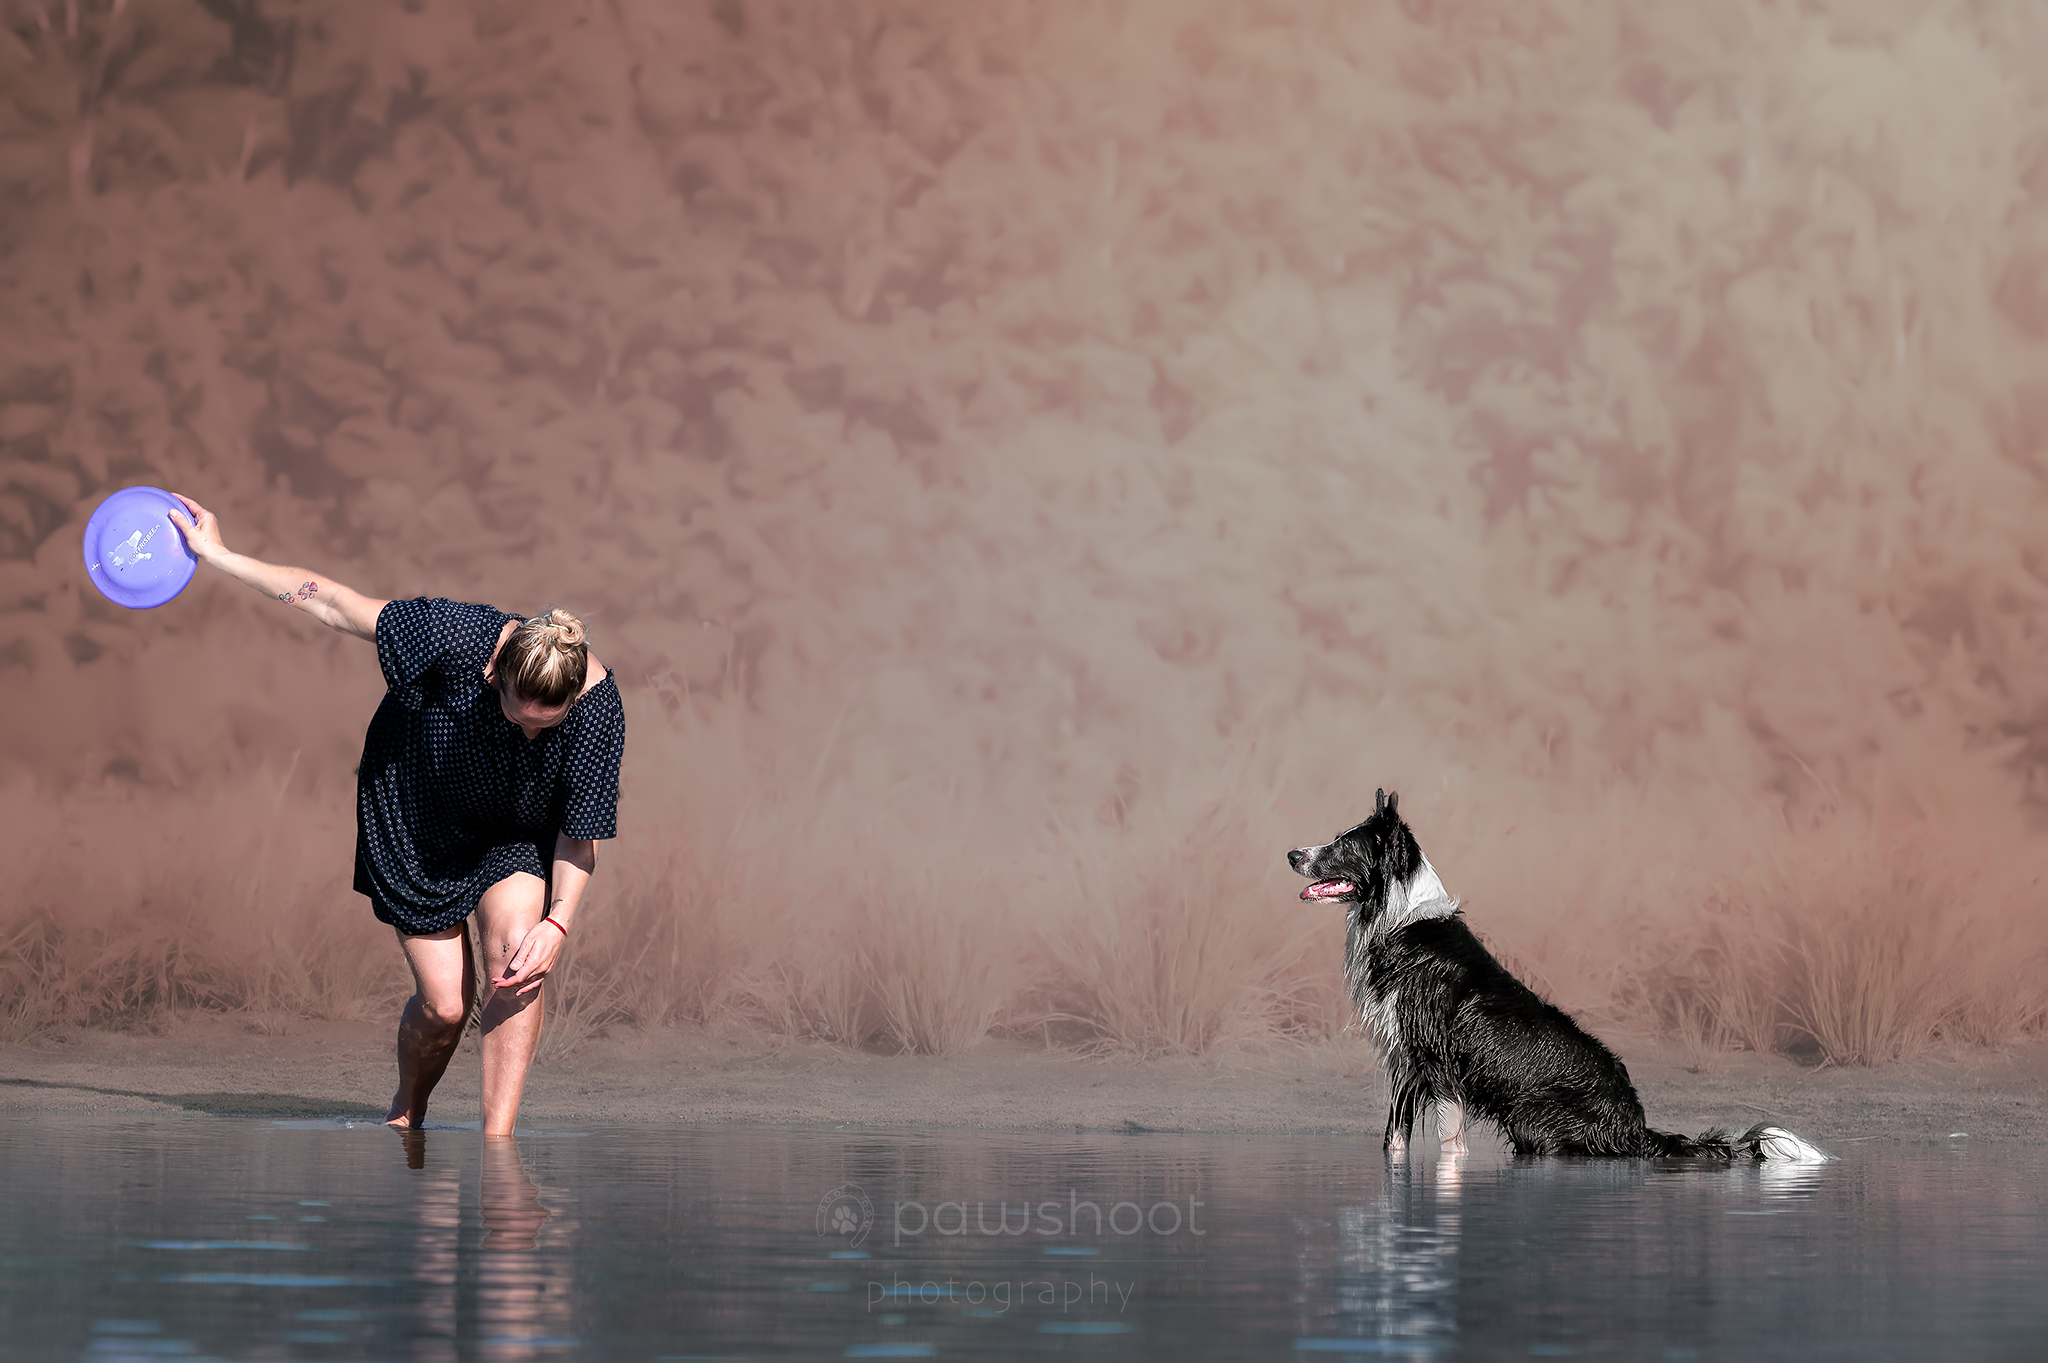 hond en frisbee start Pawshoot hondenfotografie